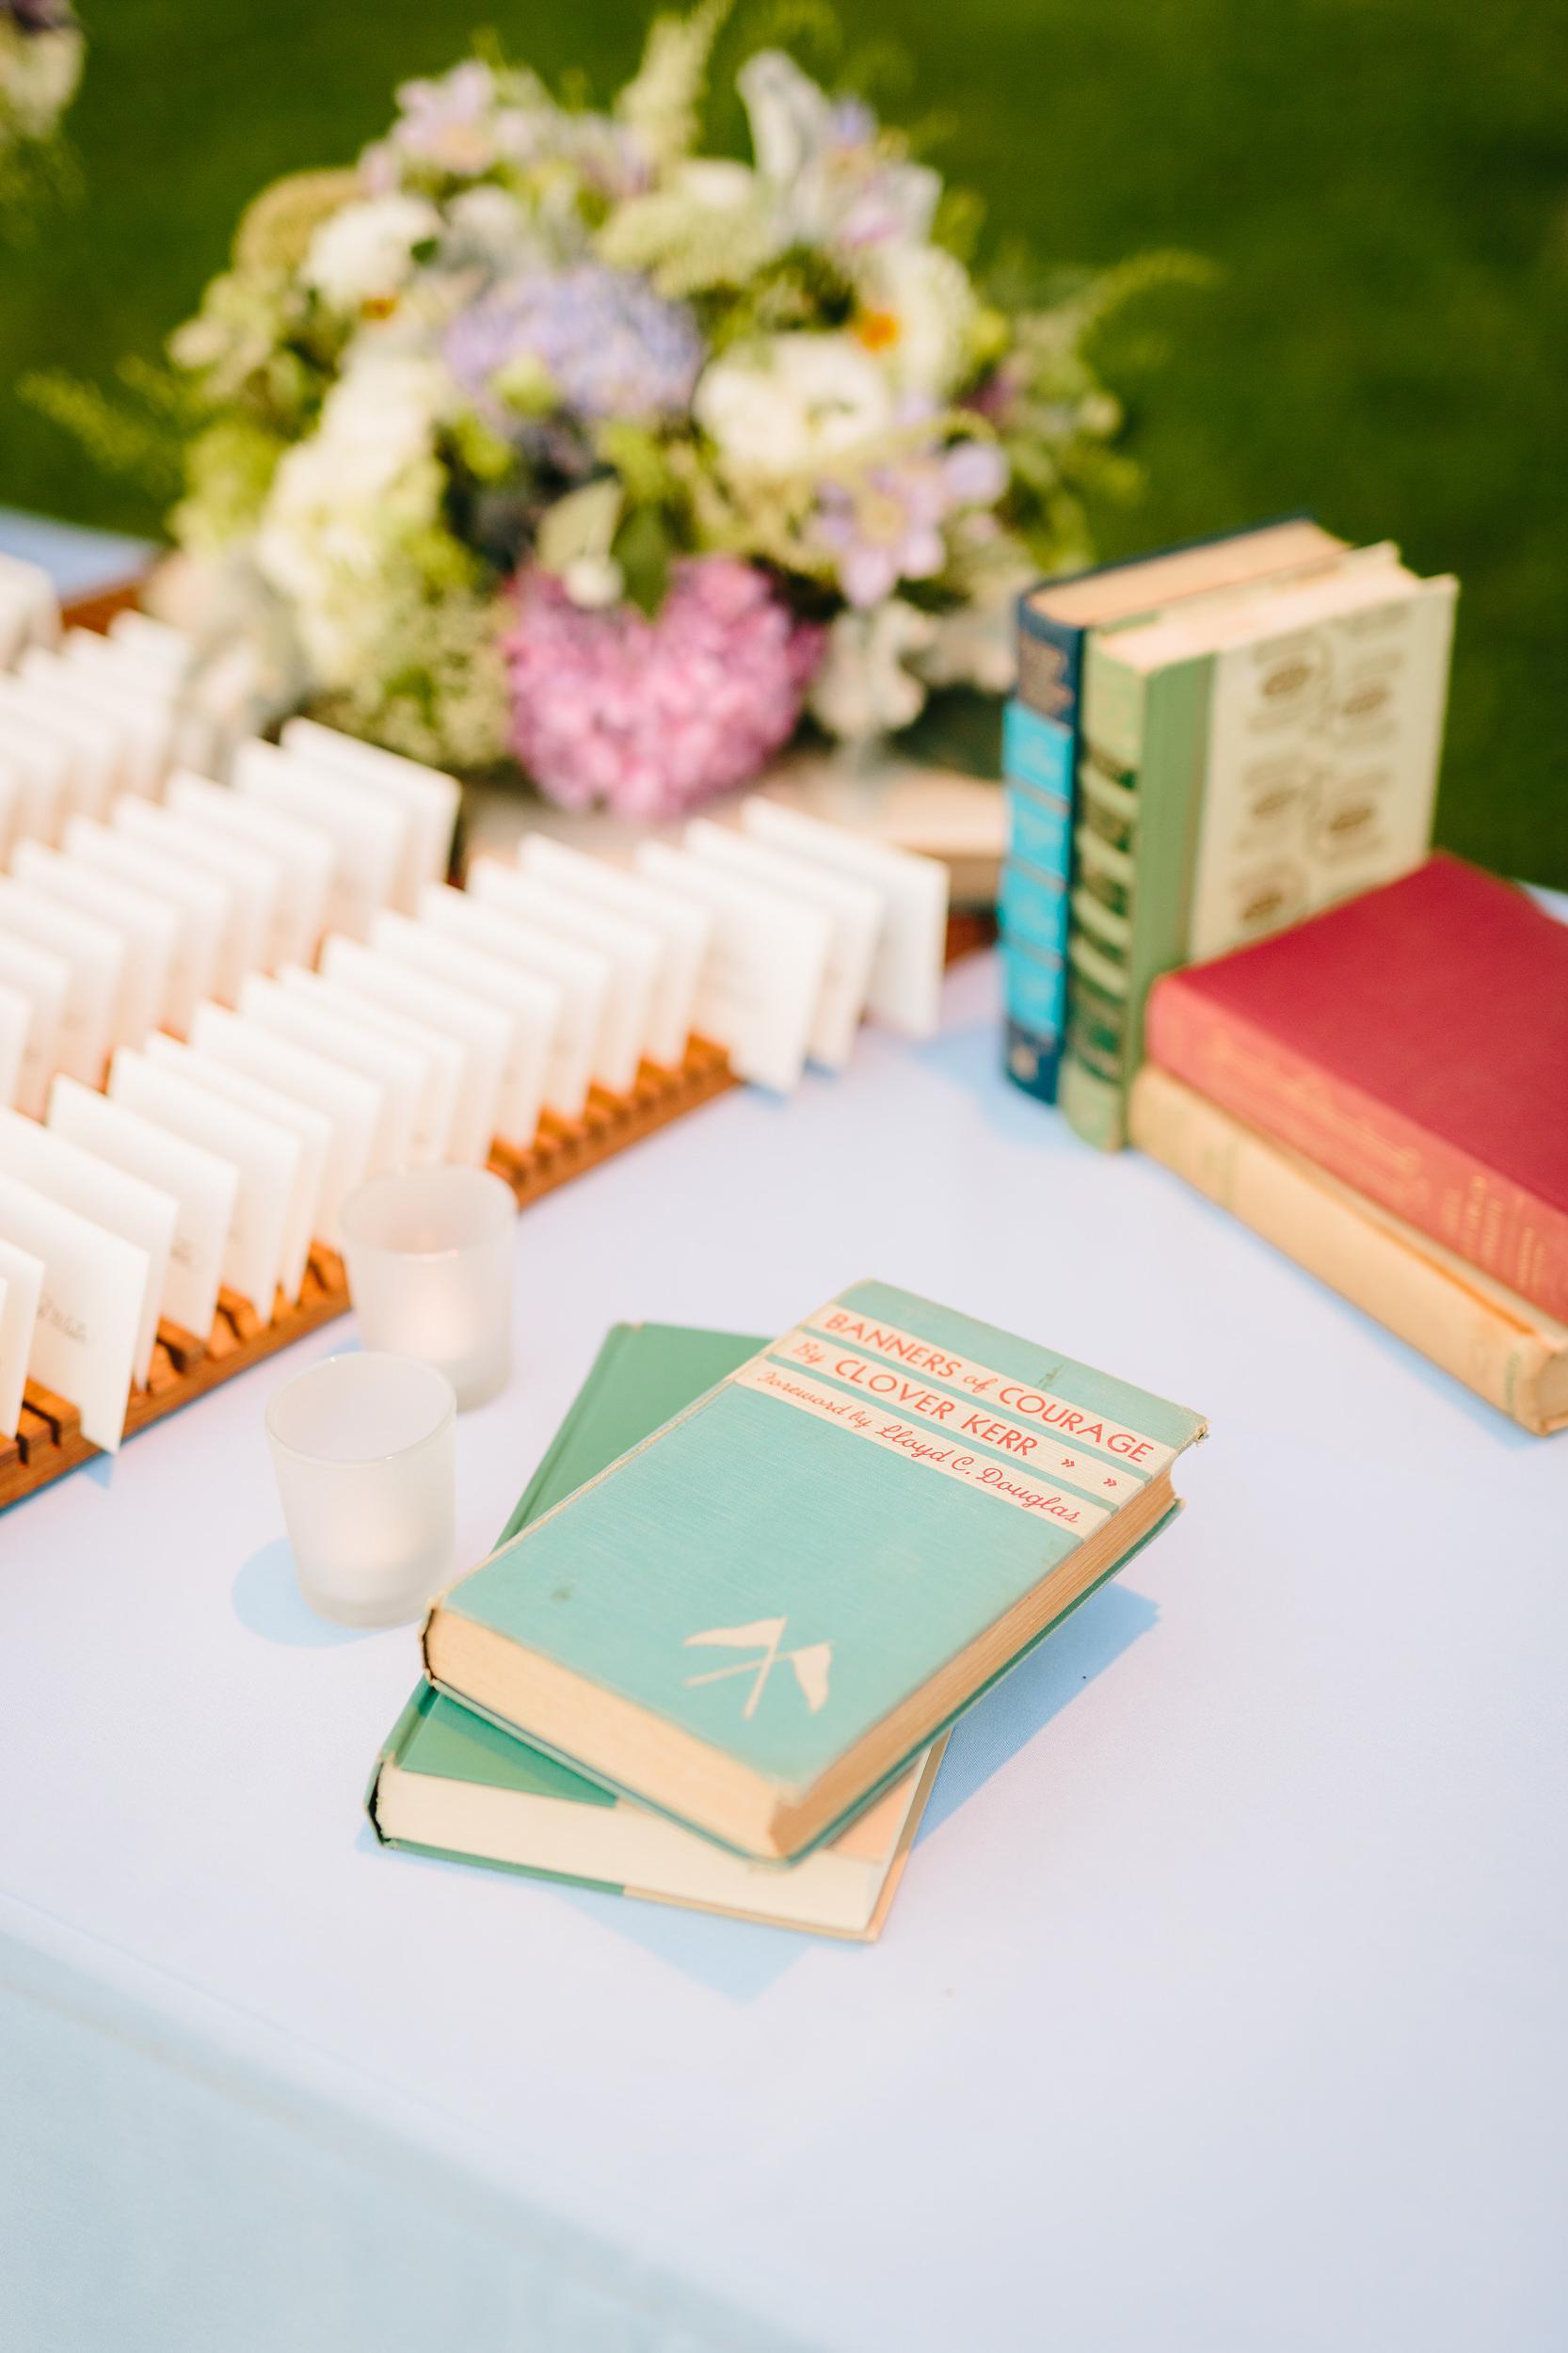 huntington-library-wedding-HP-22.jpg